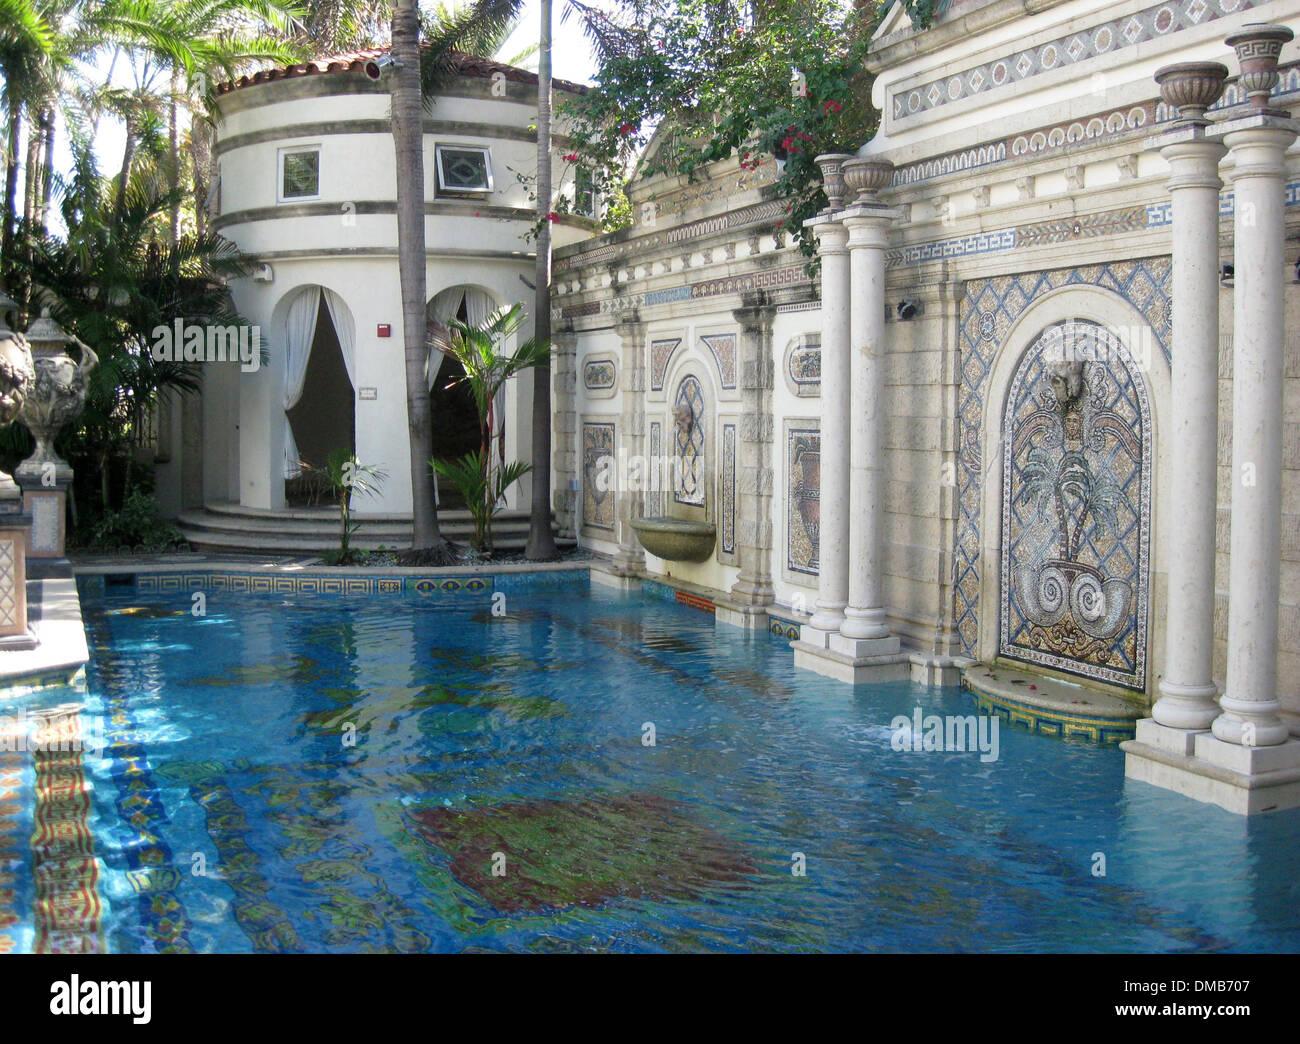 The mer home of Italian designer Gianni Versace Miami mansion Casa Stock Photo Royalty Free